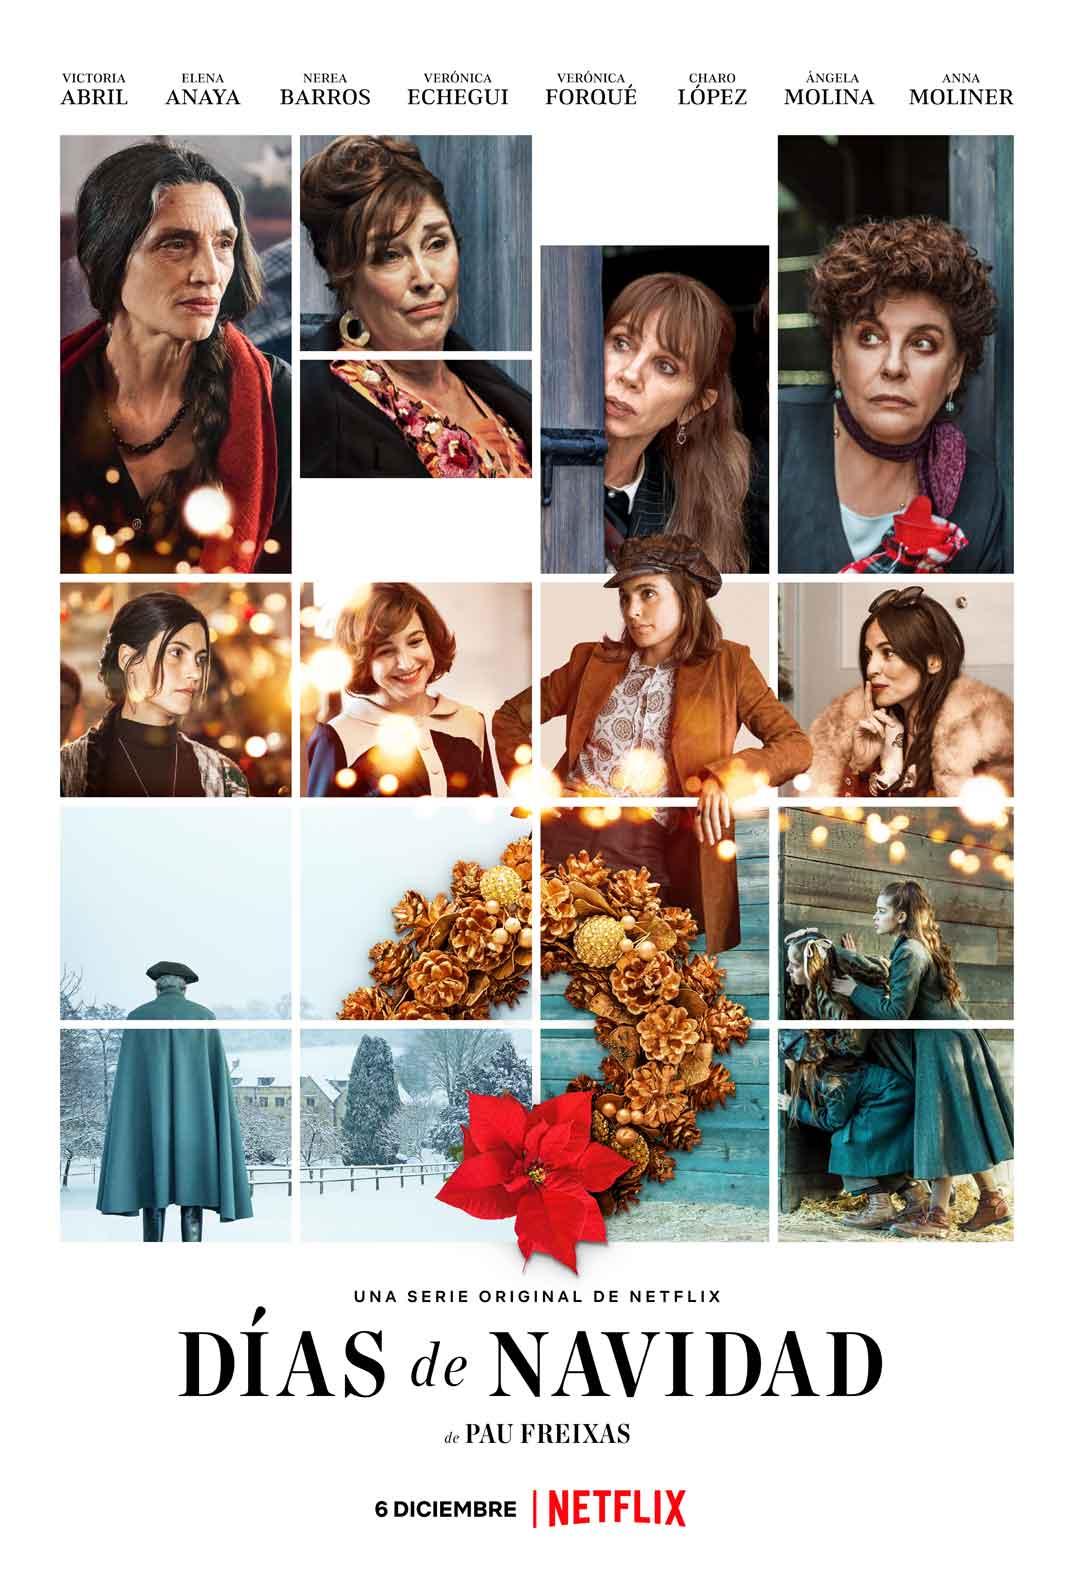 Días de Navidad © Netflix